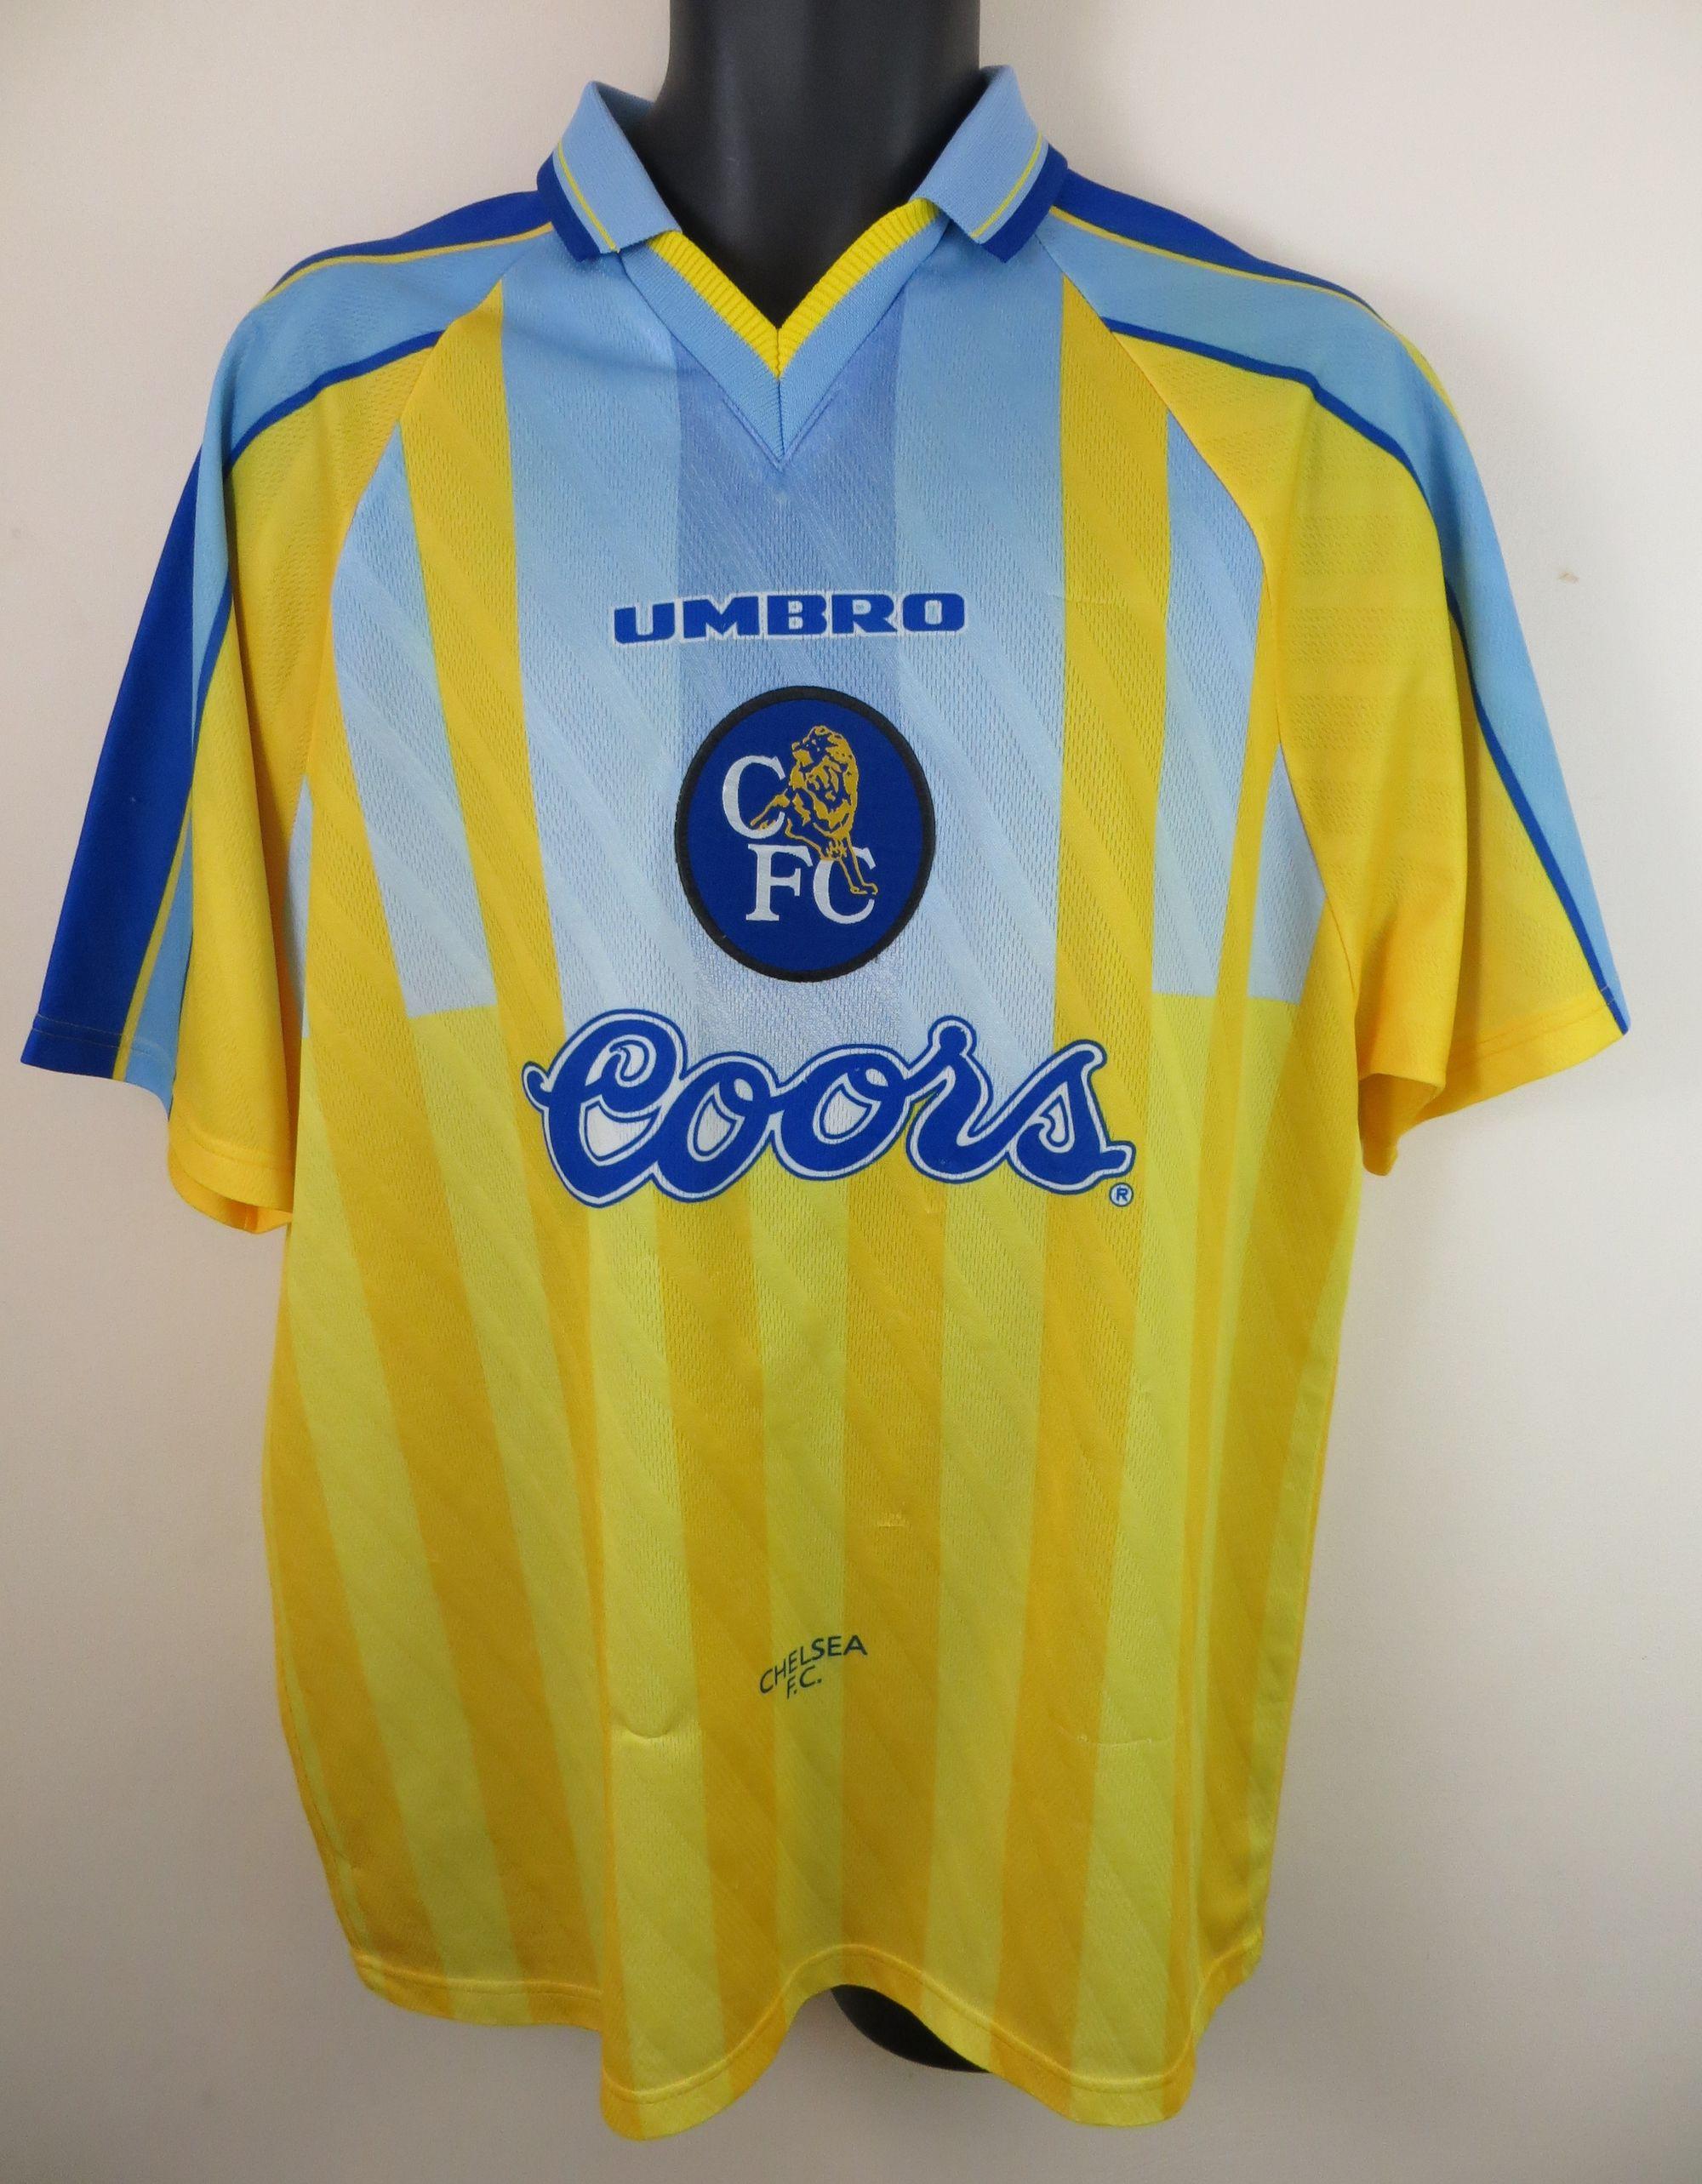 1996-97 Chelsea away shirt by Umbro | Retro football shirts ...